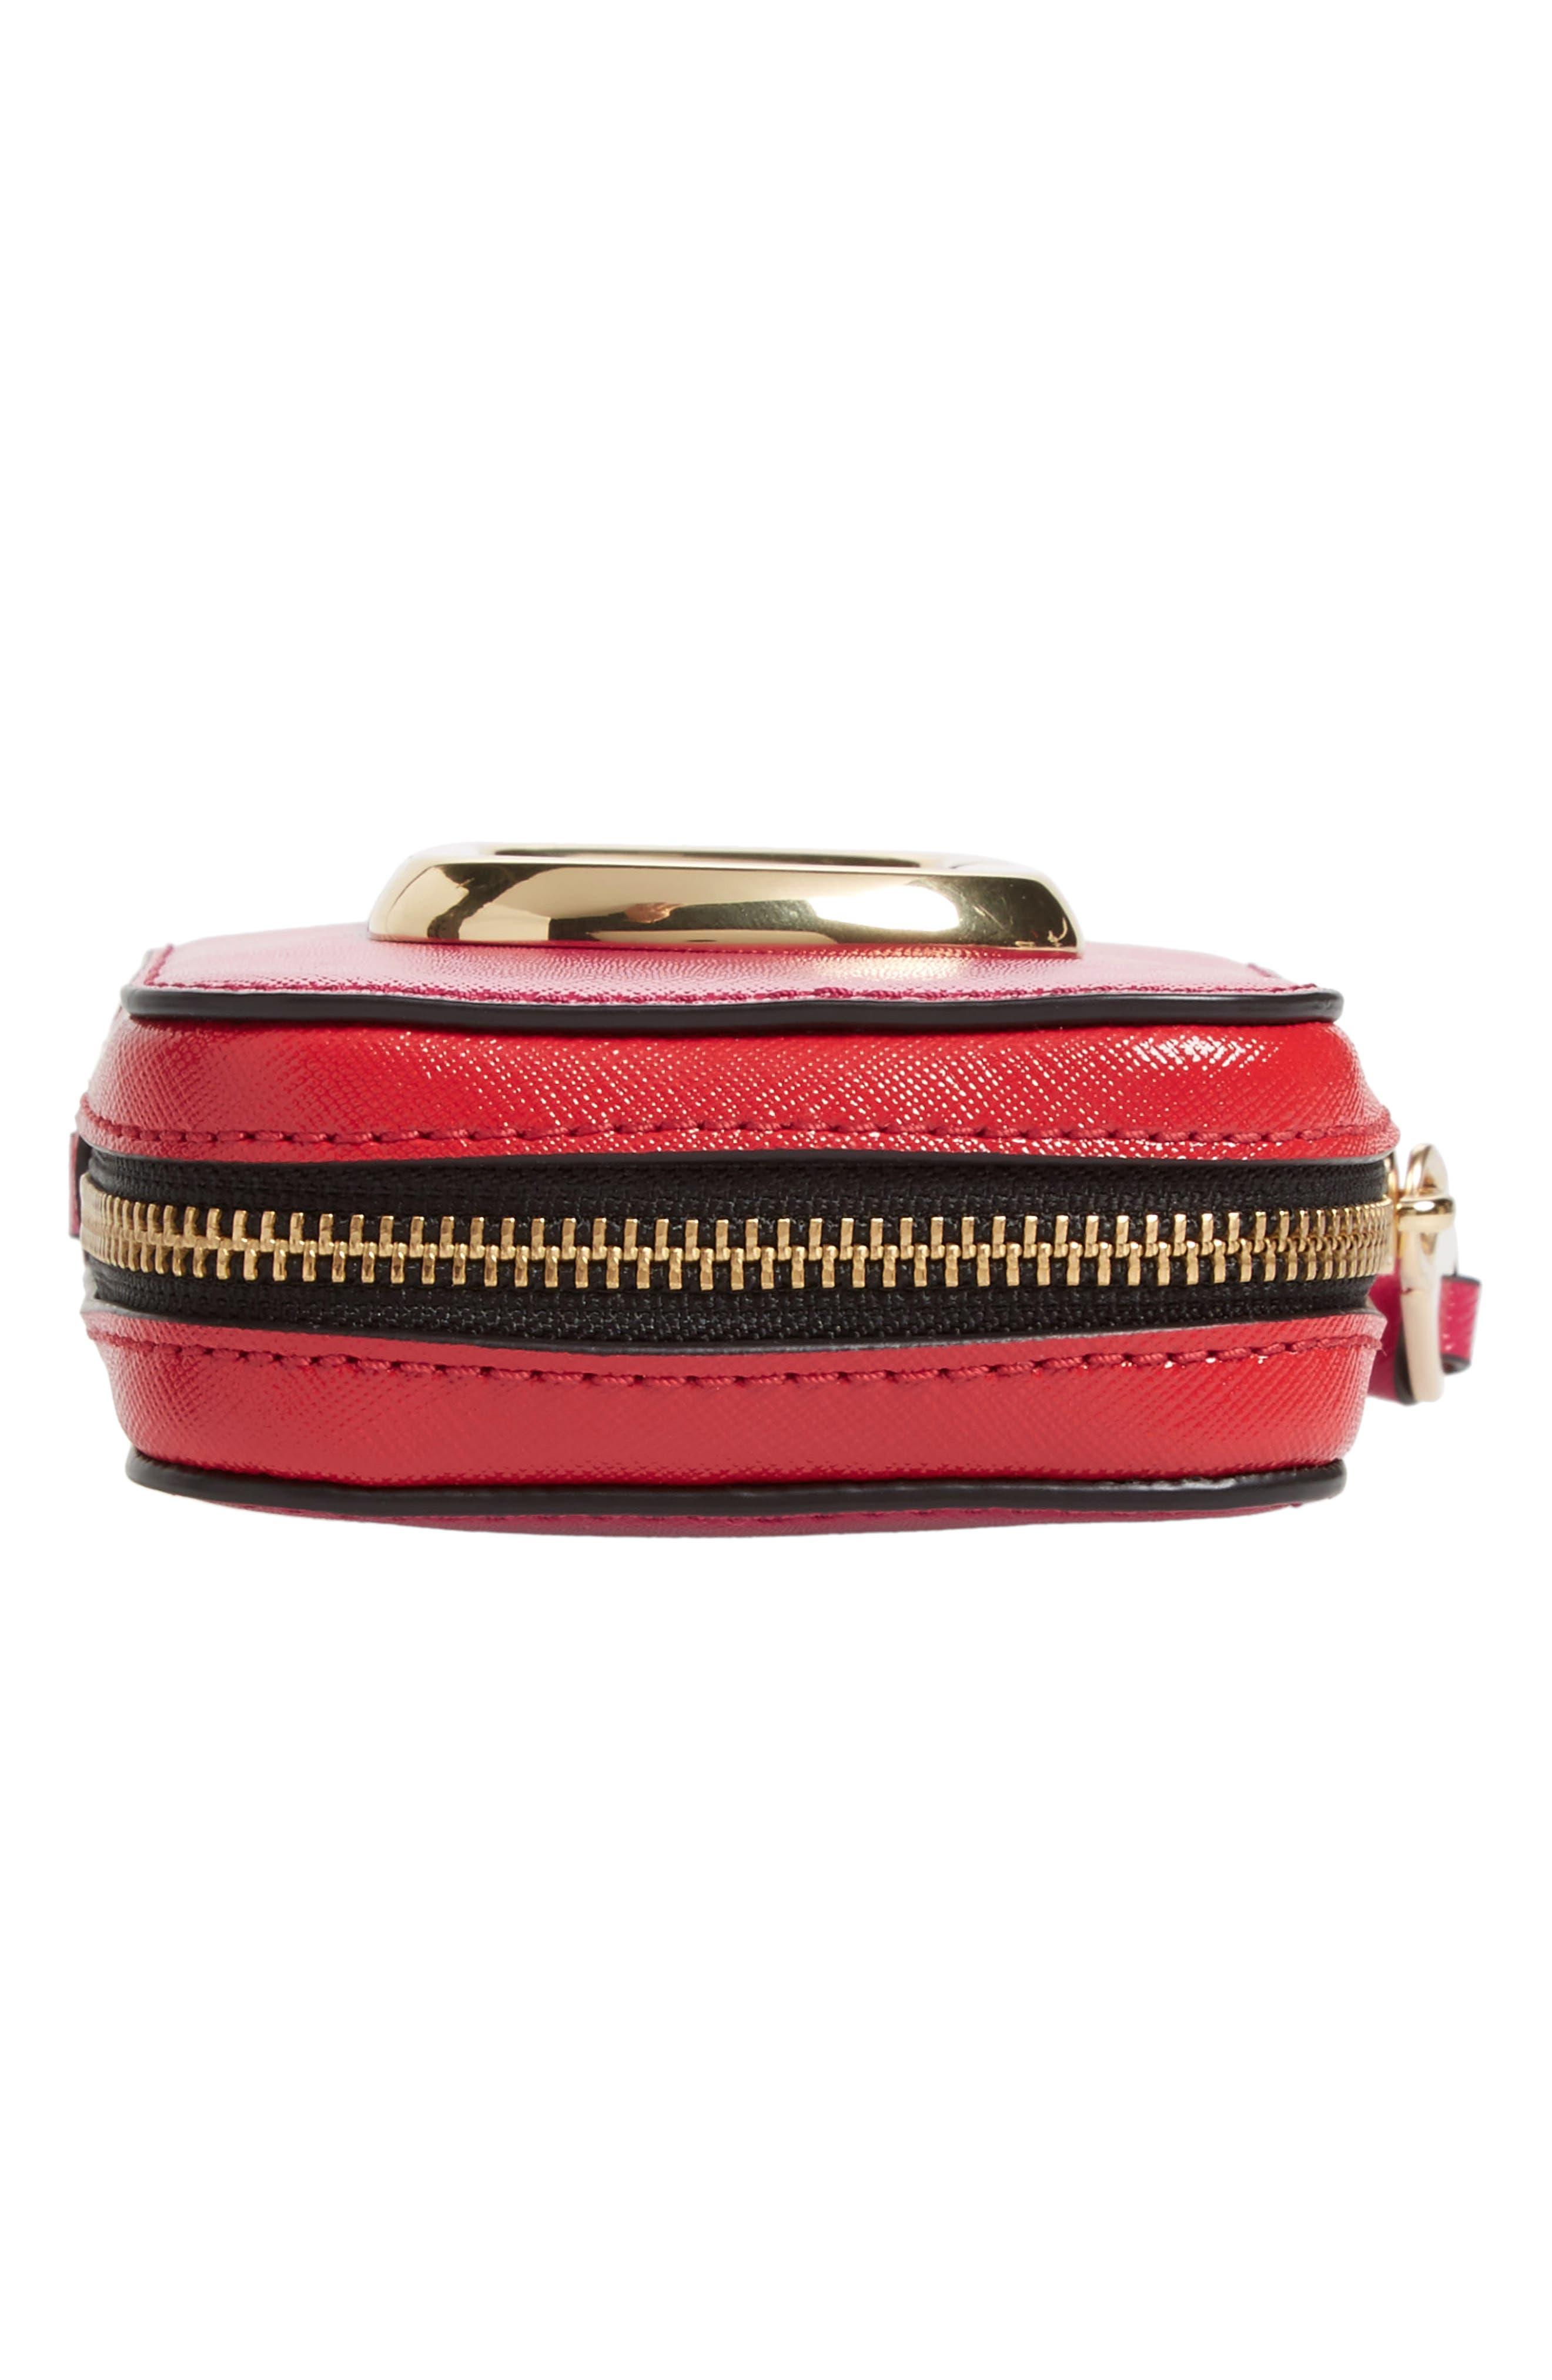 Hot Shot Saffiano Leather Shoulder Bag,                             Alternate thumbnail 22, color,